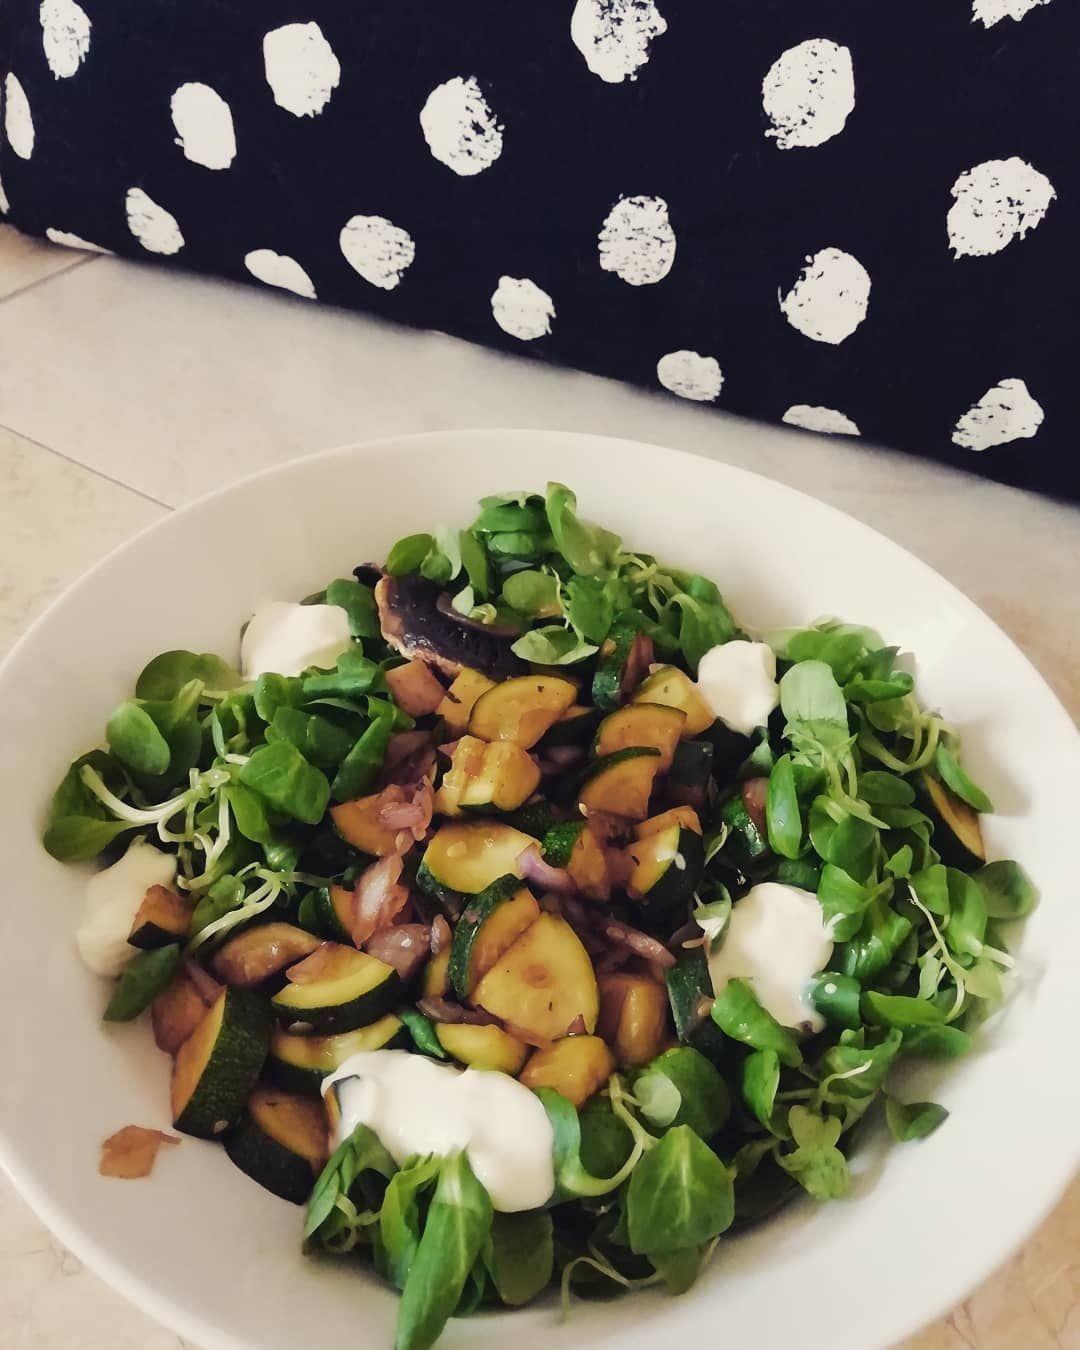 Ho fame oggi, tantissima! Valeriana, funghi champignon, zucchine, cipolla e stracchino vegetale.